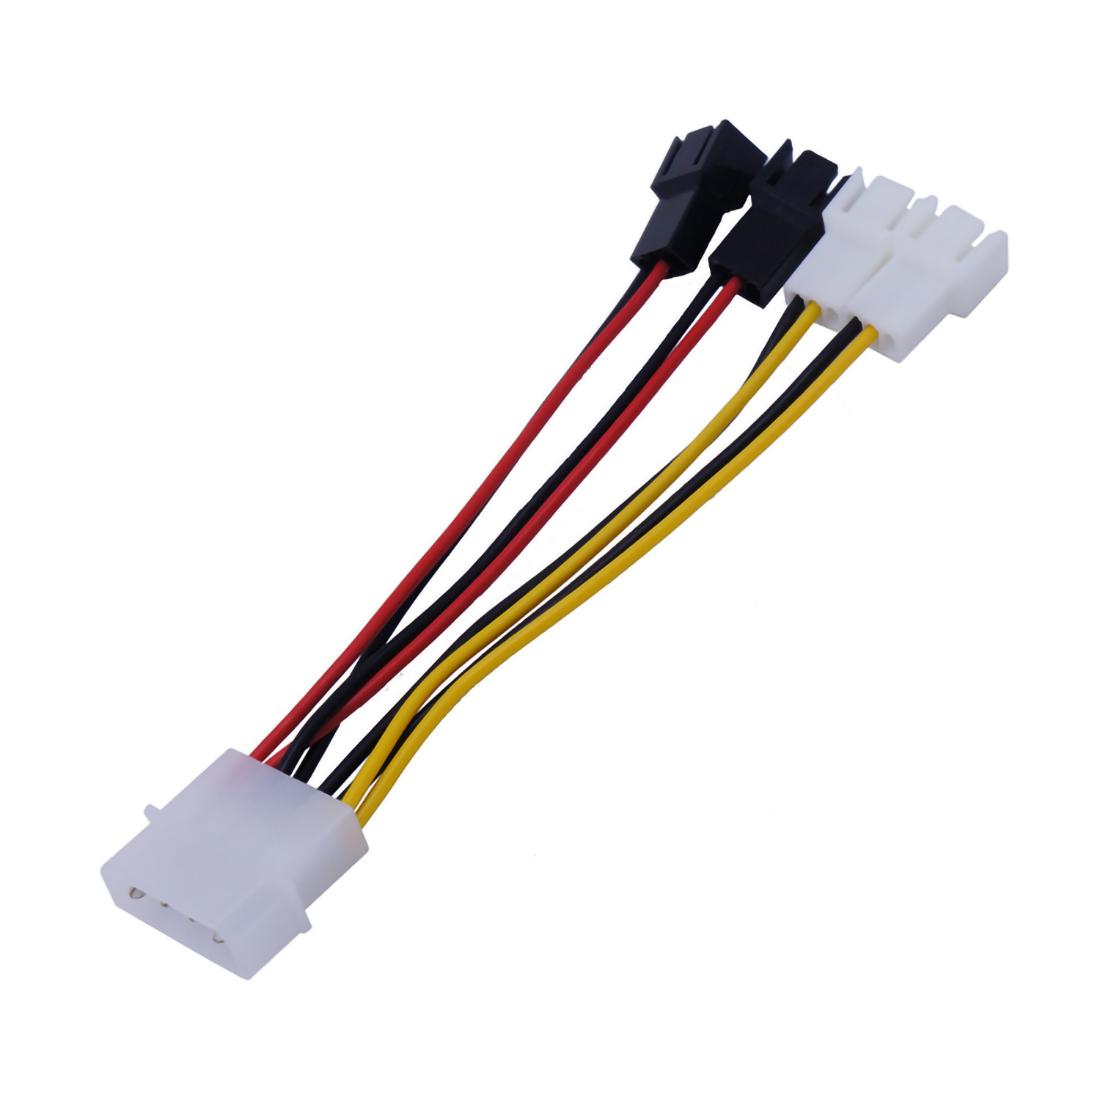 2pcs//5pcs USB to 4 Pin Molex Fan Power Cable Computer Case Adapter Cord 12V